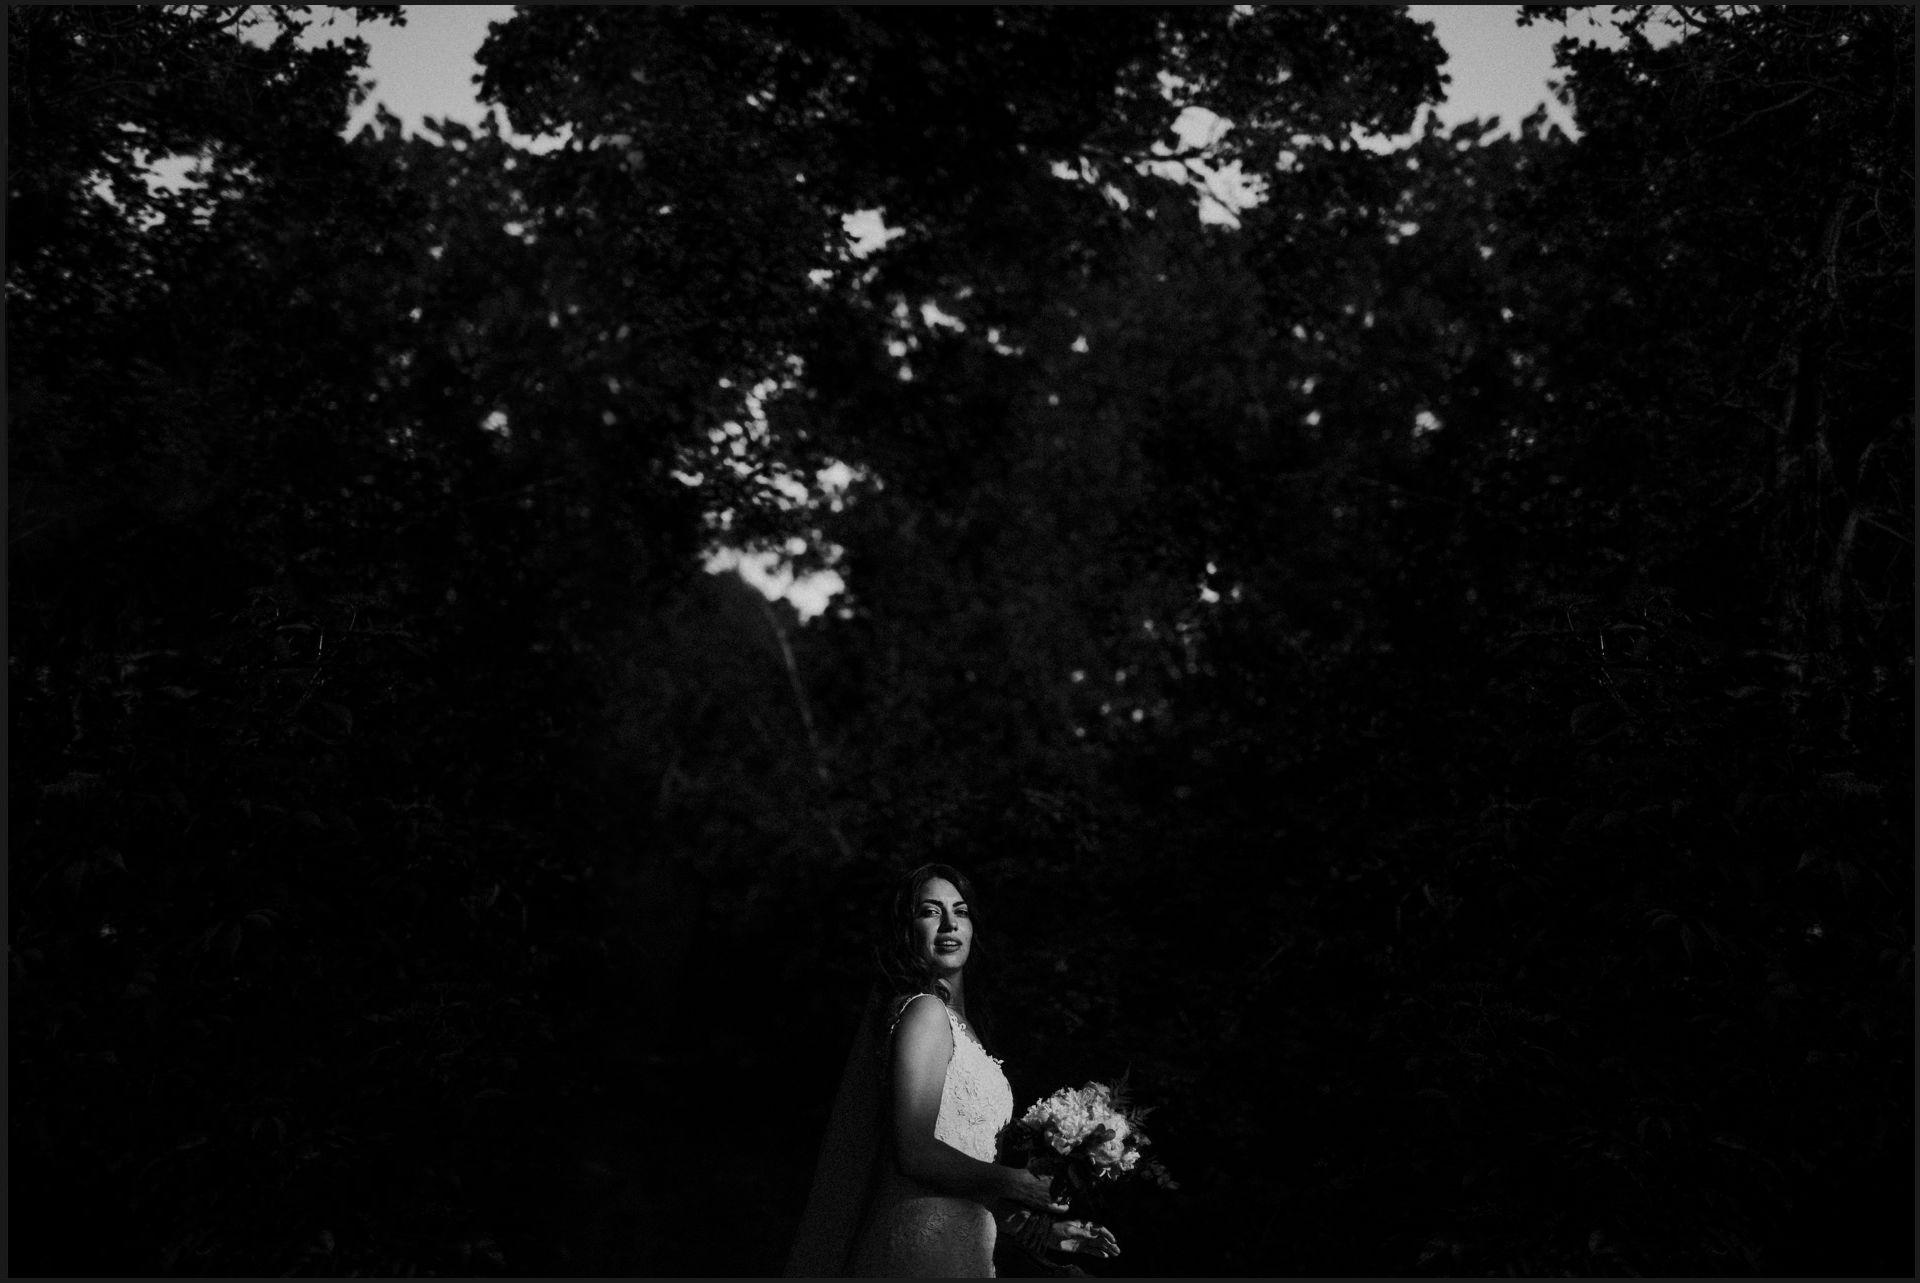 black and white, wedding, umbria, nikis resort, bride, dark, dramatic, alternative